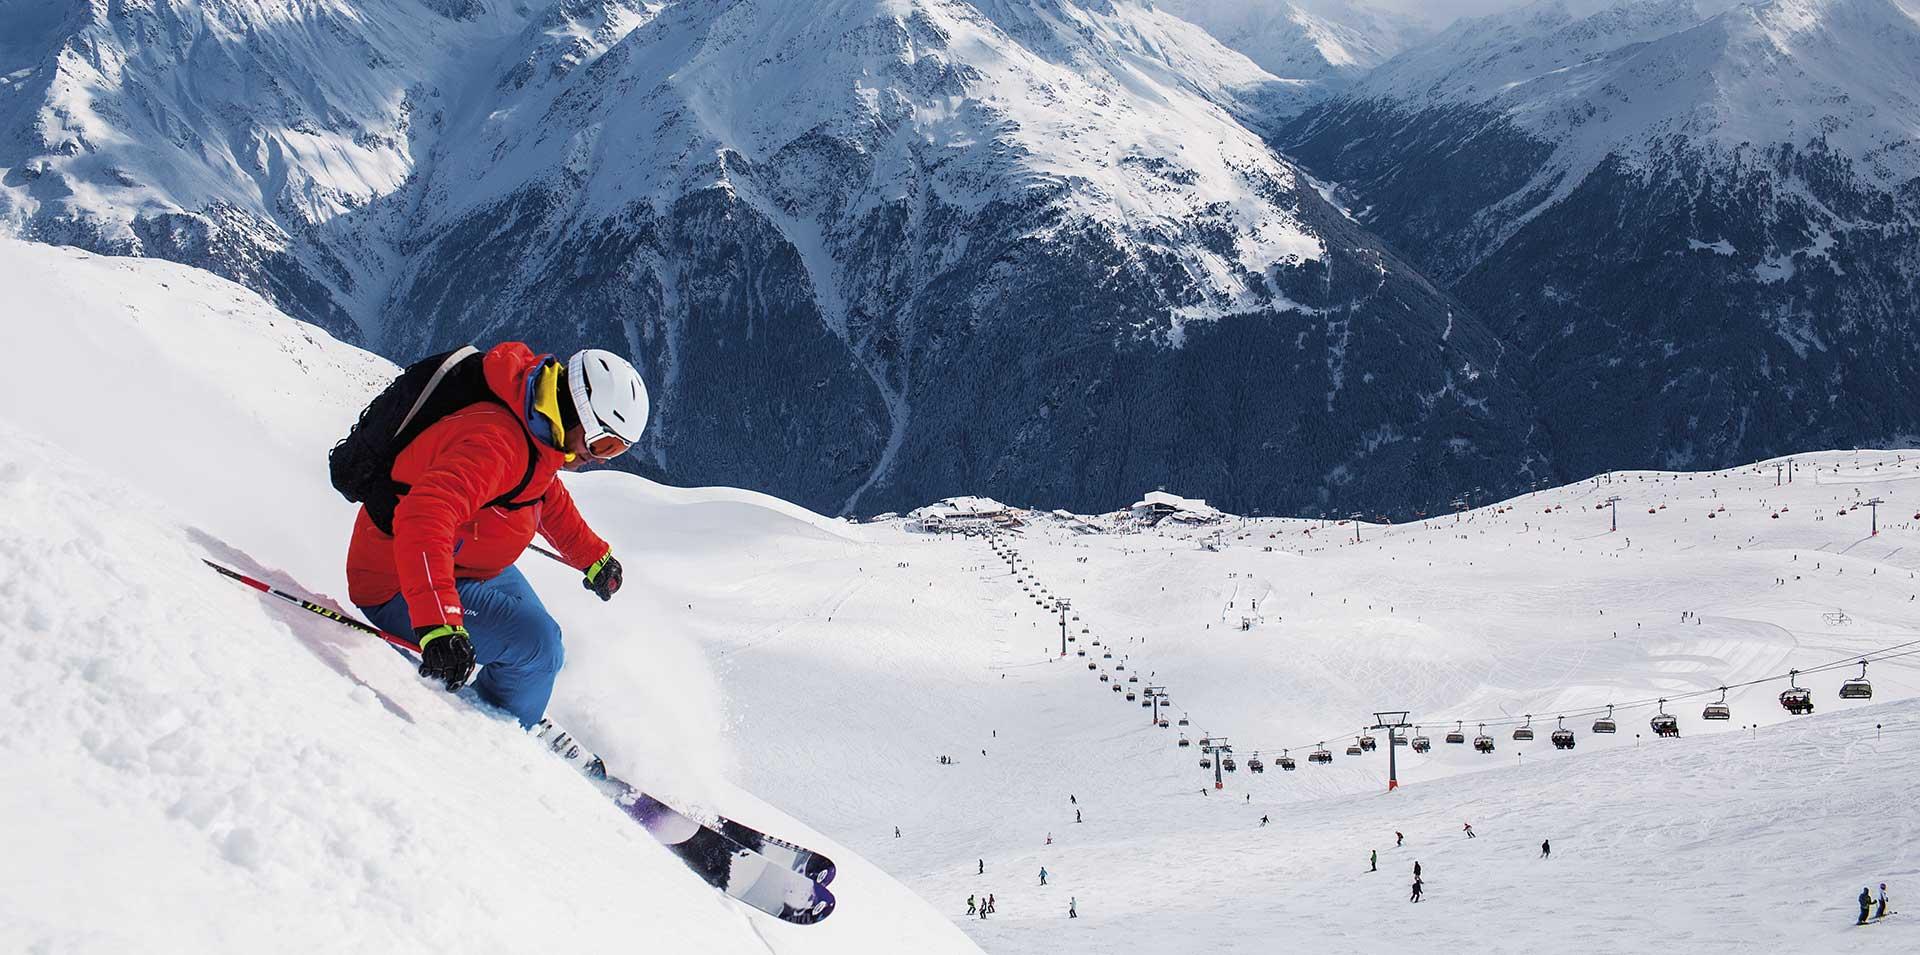 soel_skifahren_08_13